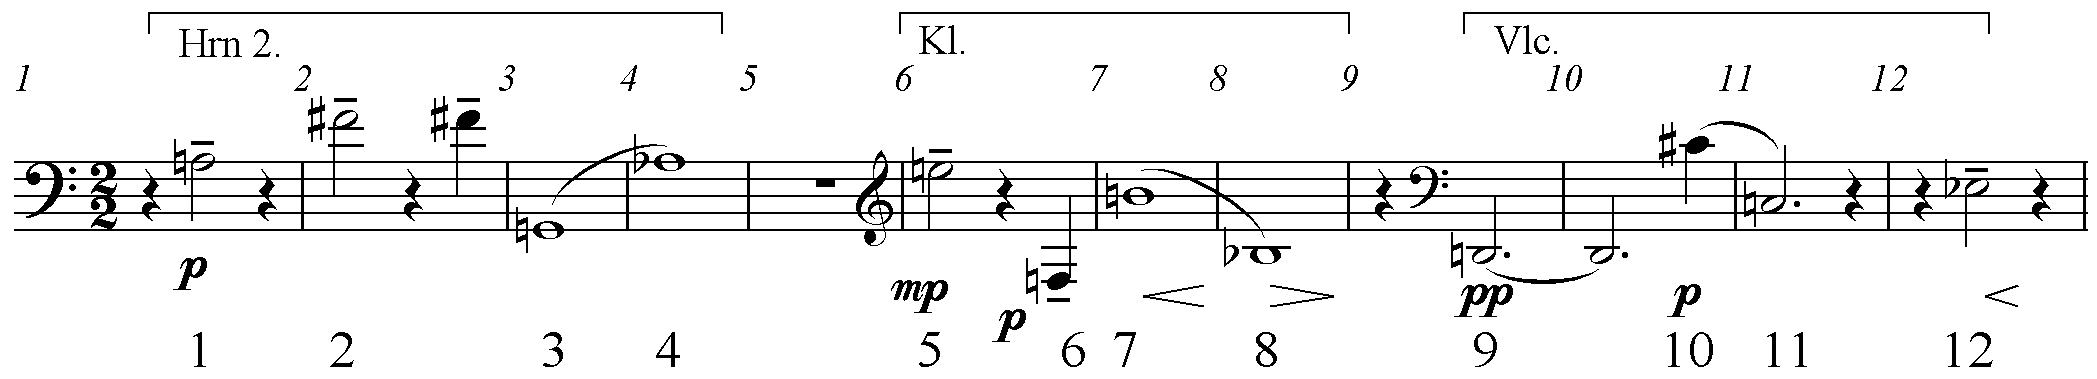 Webern Symphony Ex02.png